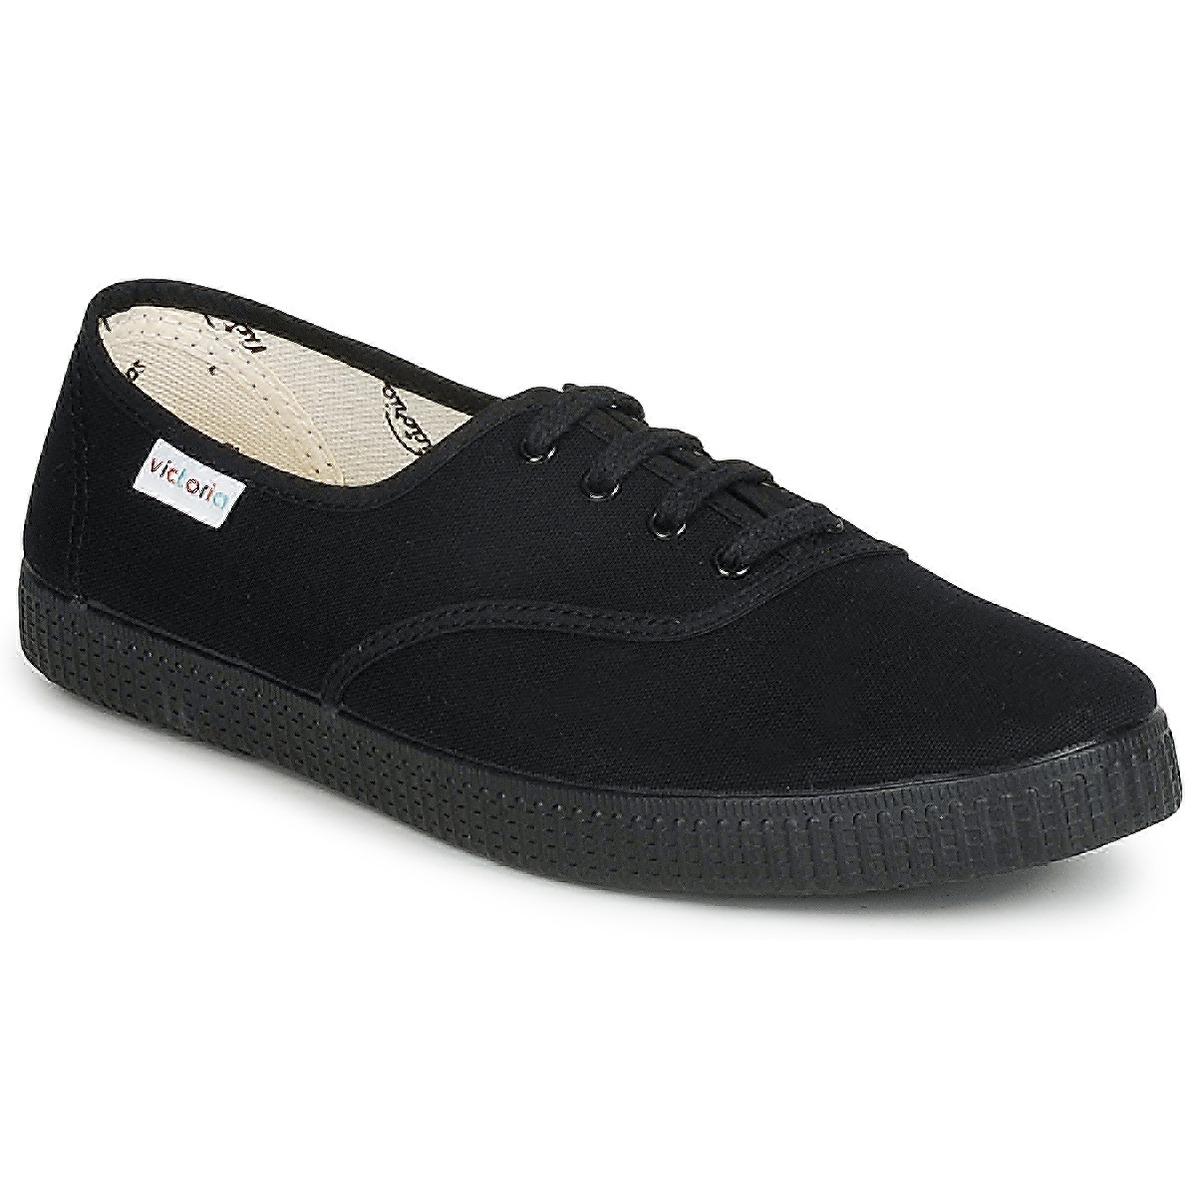 Victoria INGLESA LONA PISO Schwarz - Kostenloser Versand bei Spartoode ! - Schuhe Sneaker Low  23,20 €